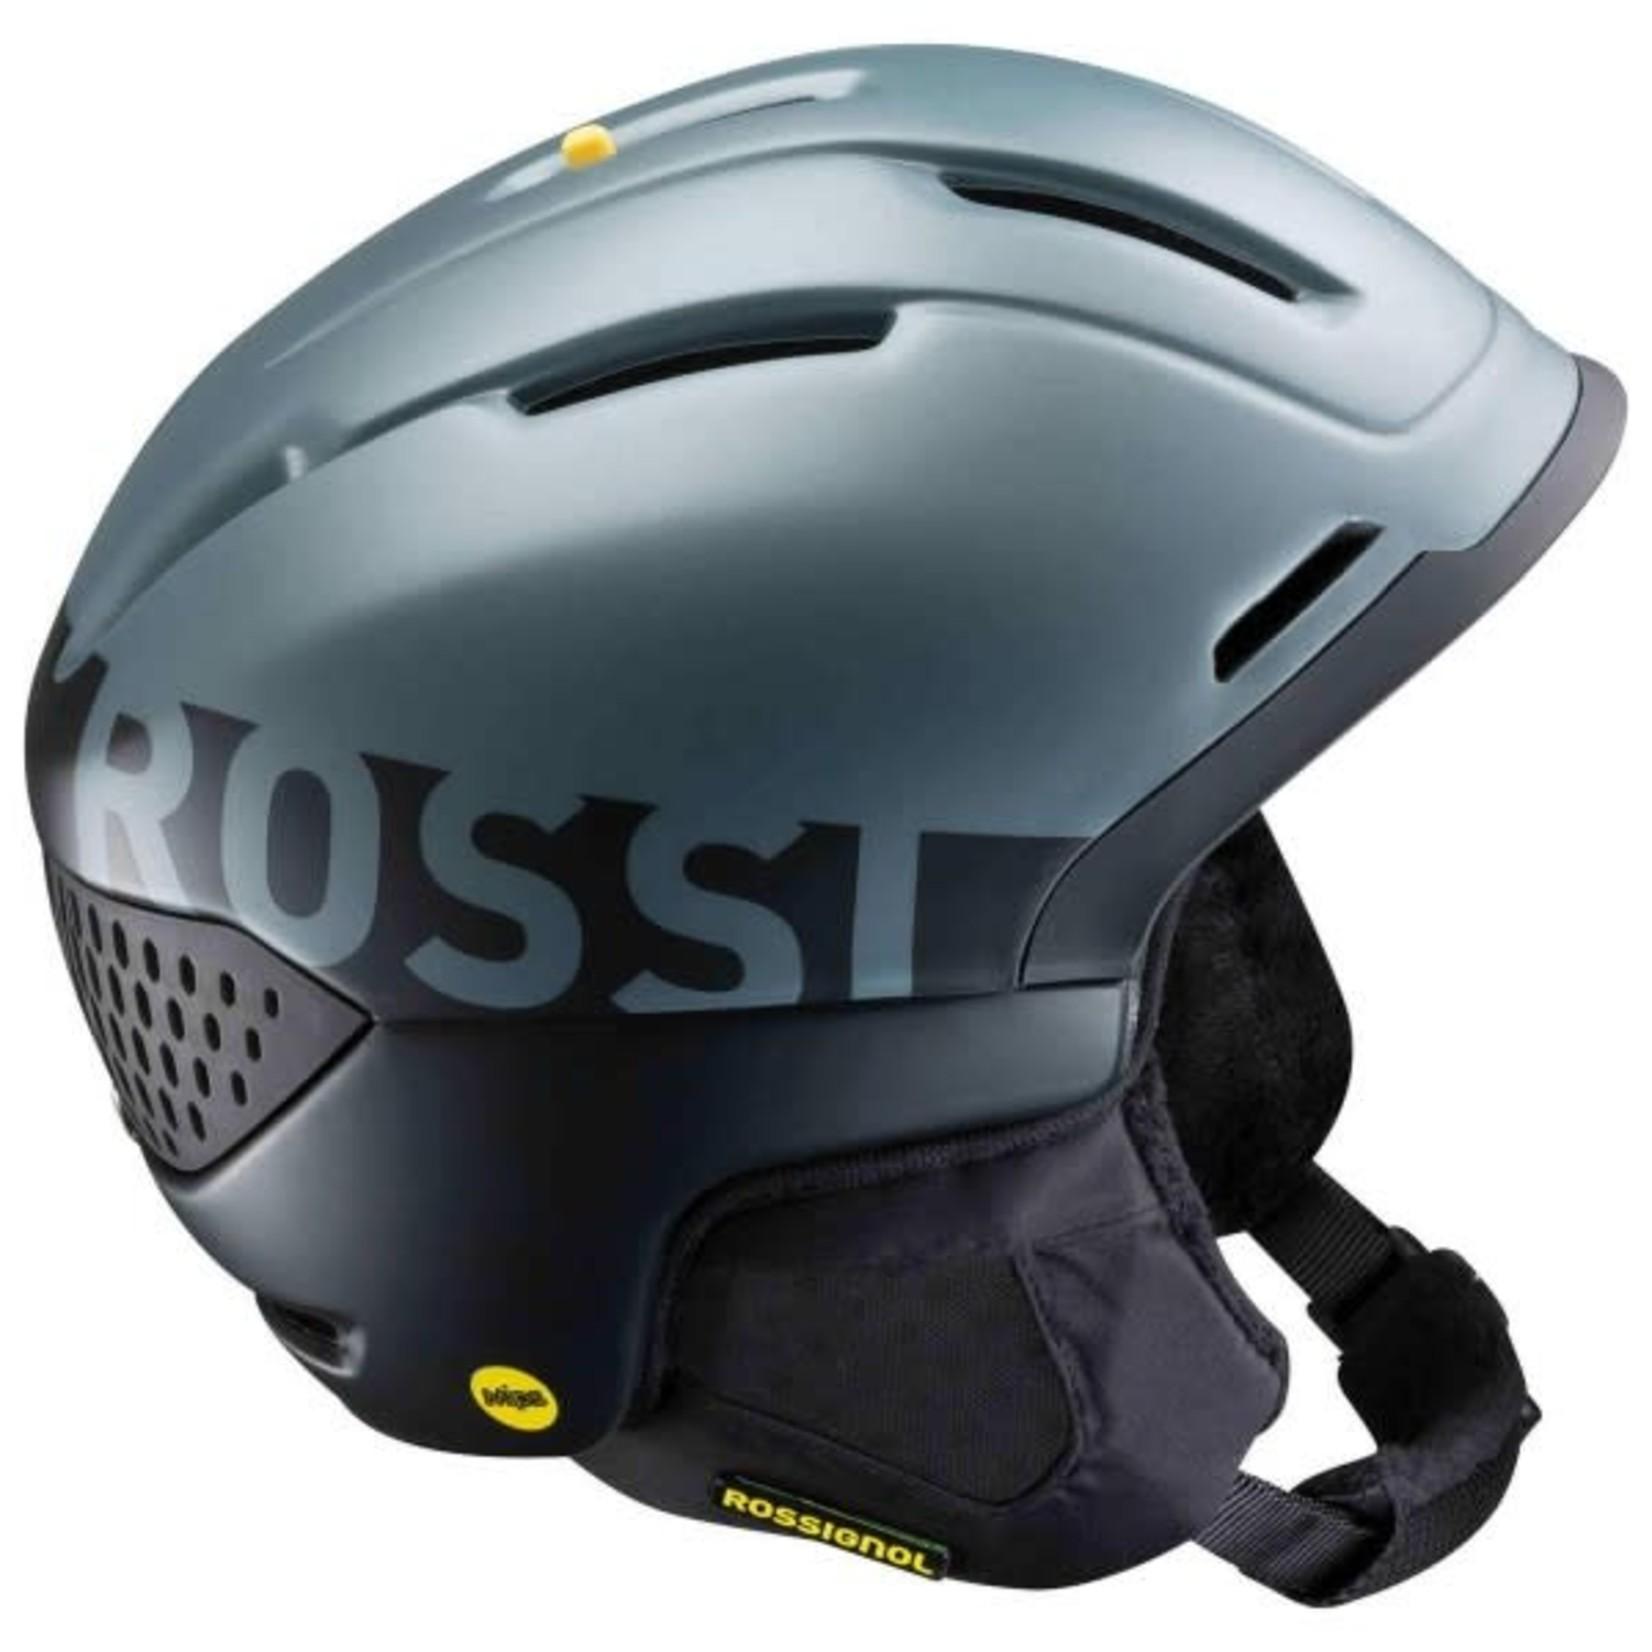 Rossignol Casque Ski Alpin Rossignol Progress Mips